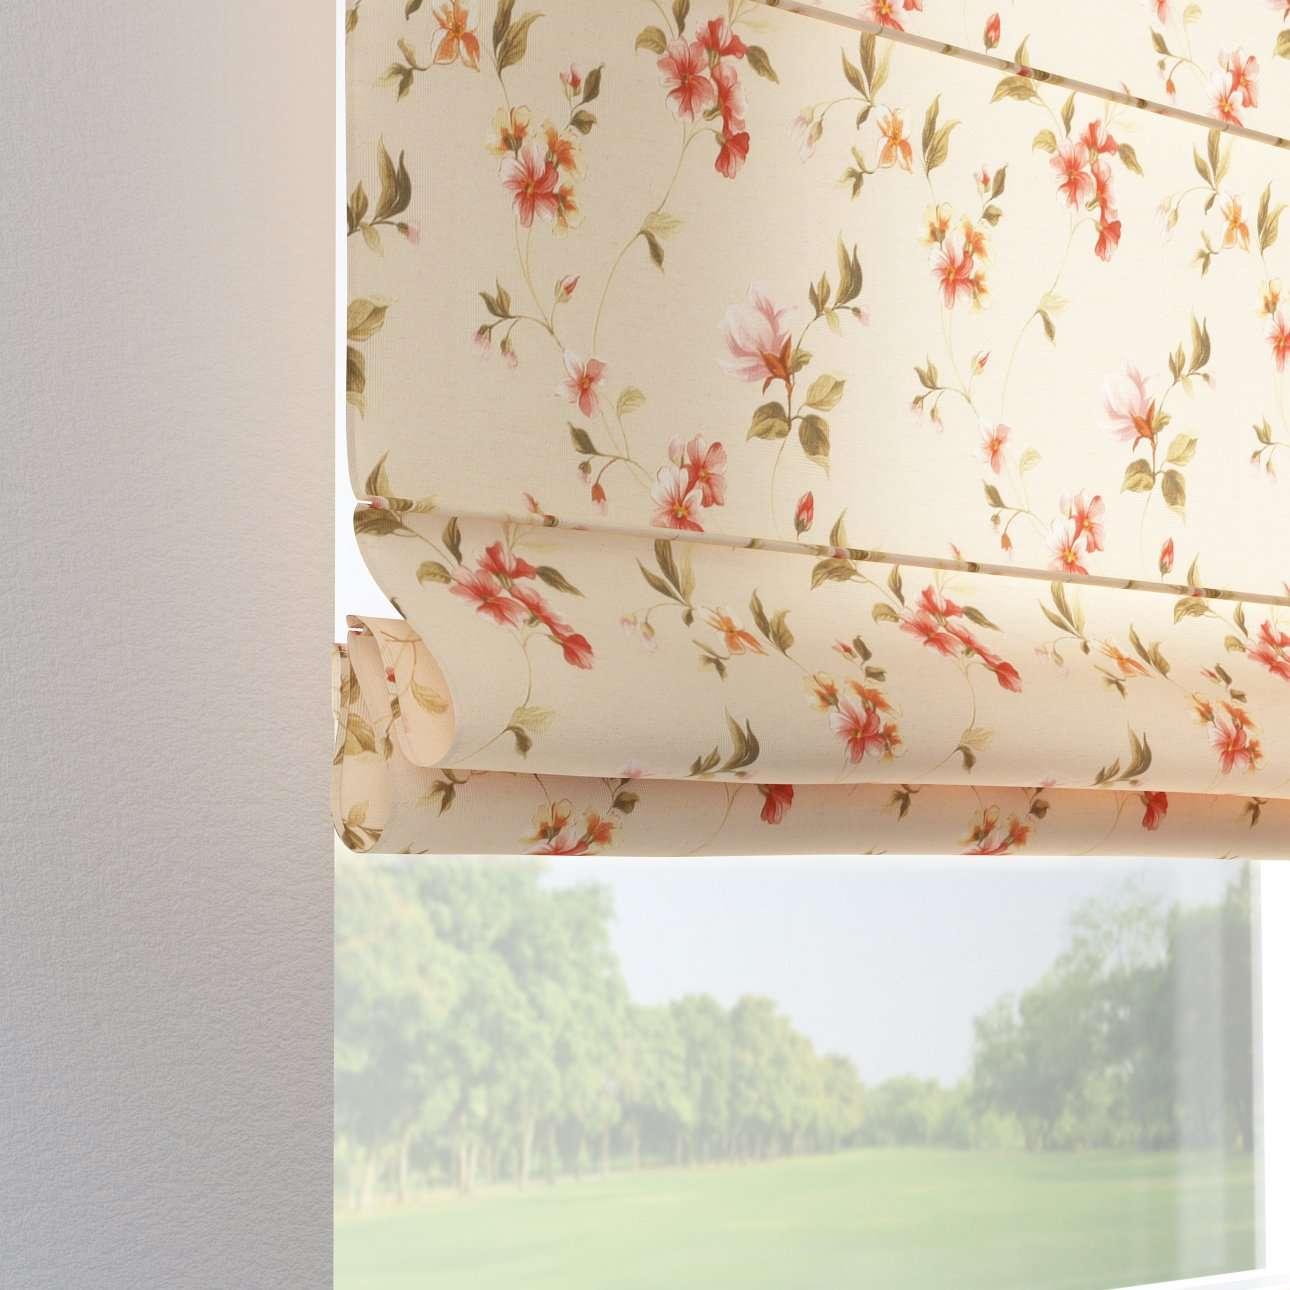 Foldegardin Verona<br/>Med stropper til gardinstang 80 x 170 cm fra kollektionen Londres, Stof: 124-05